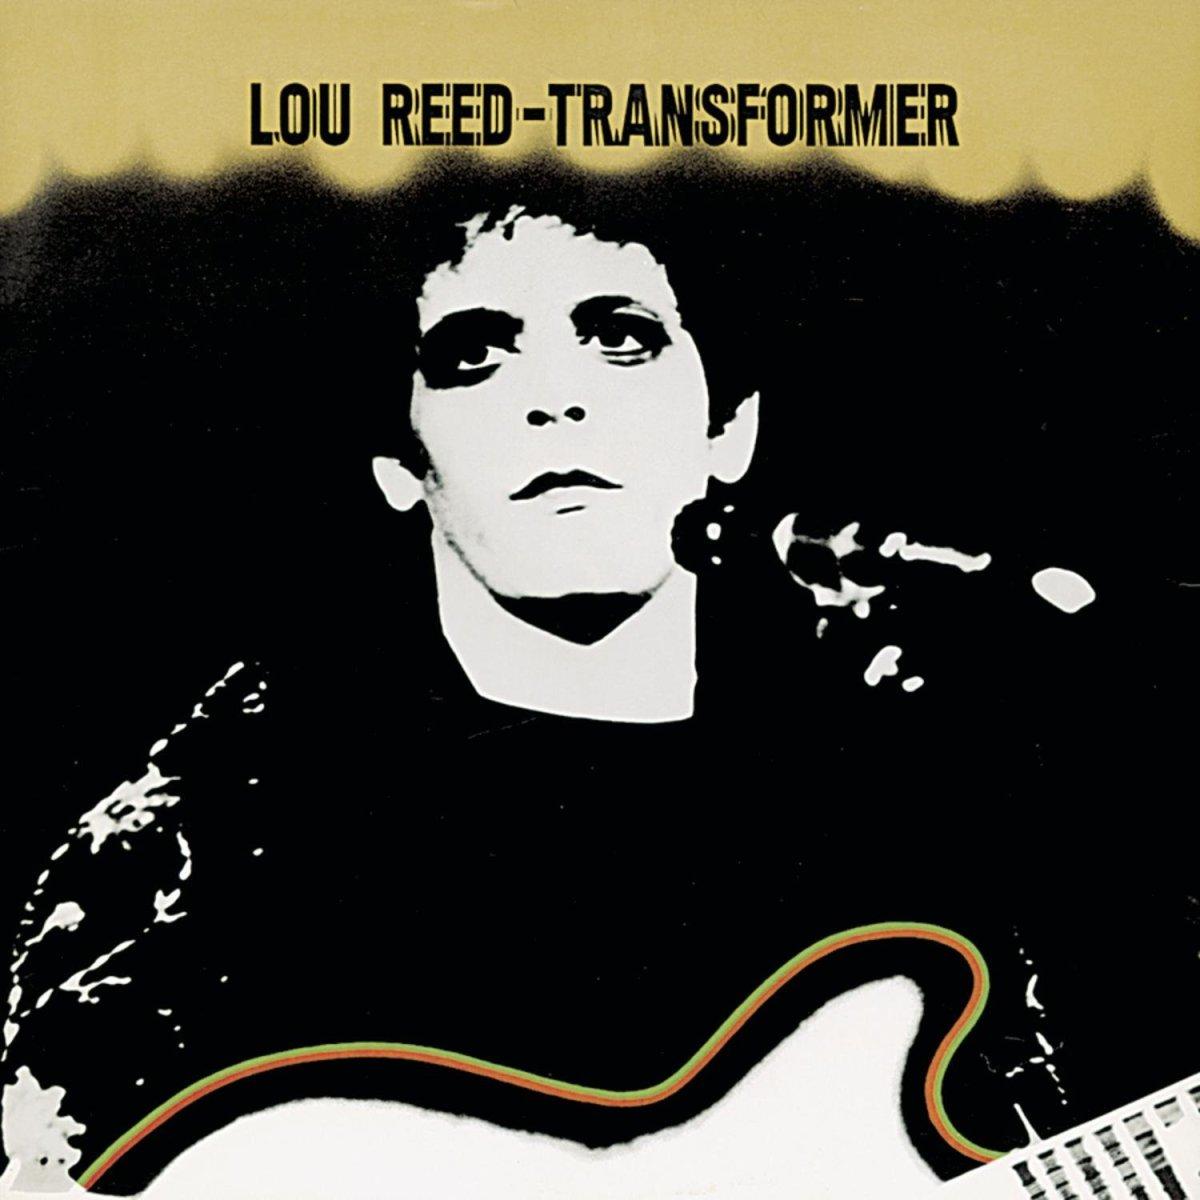 reed-transformer